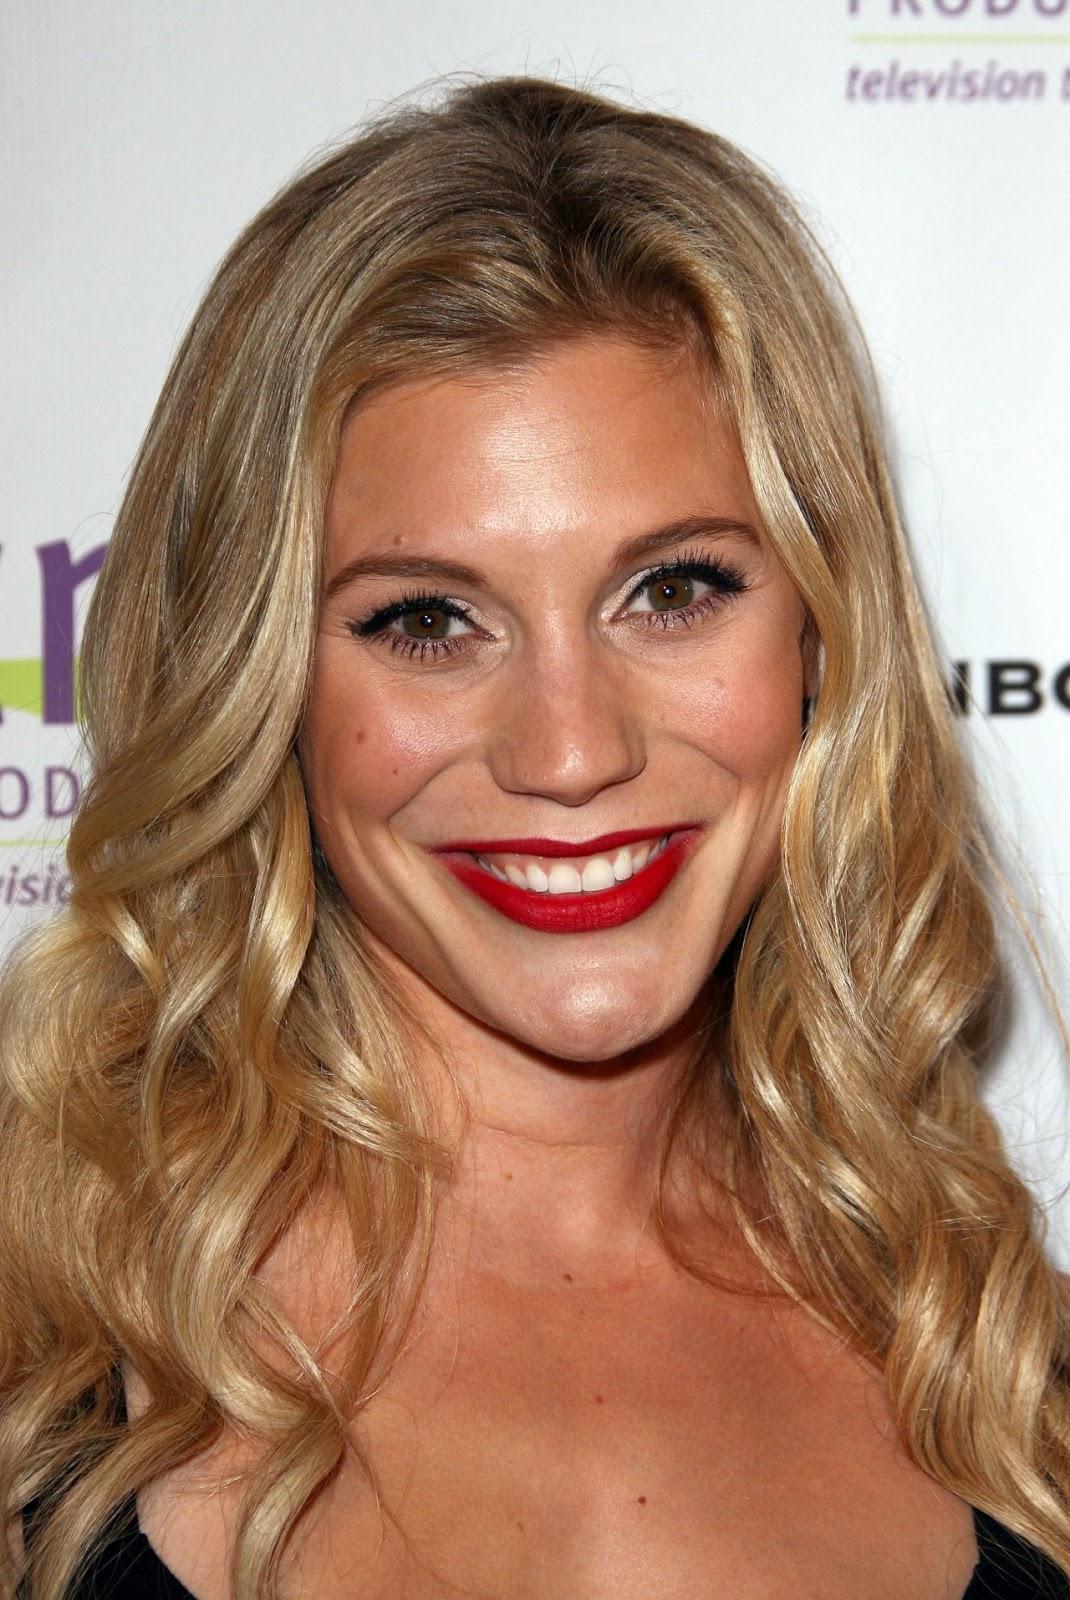 Hollywood Celebrities: Katee Sackhoff Photos